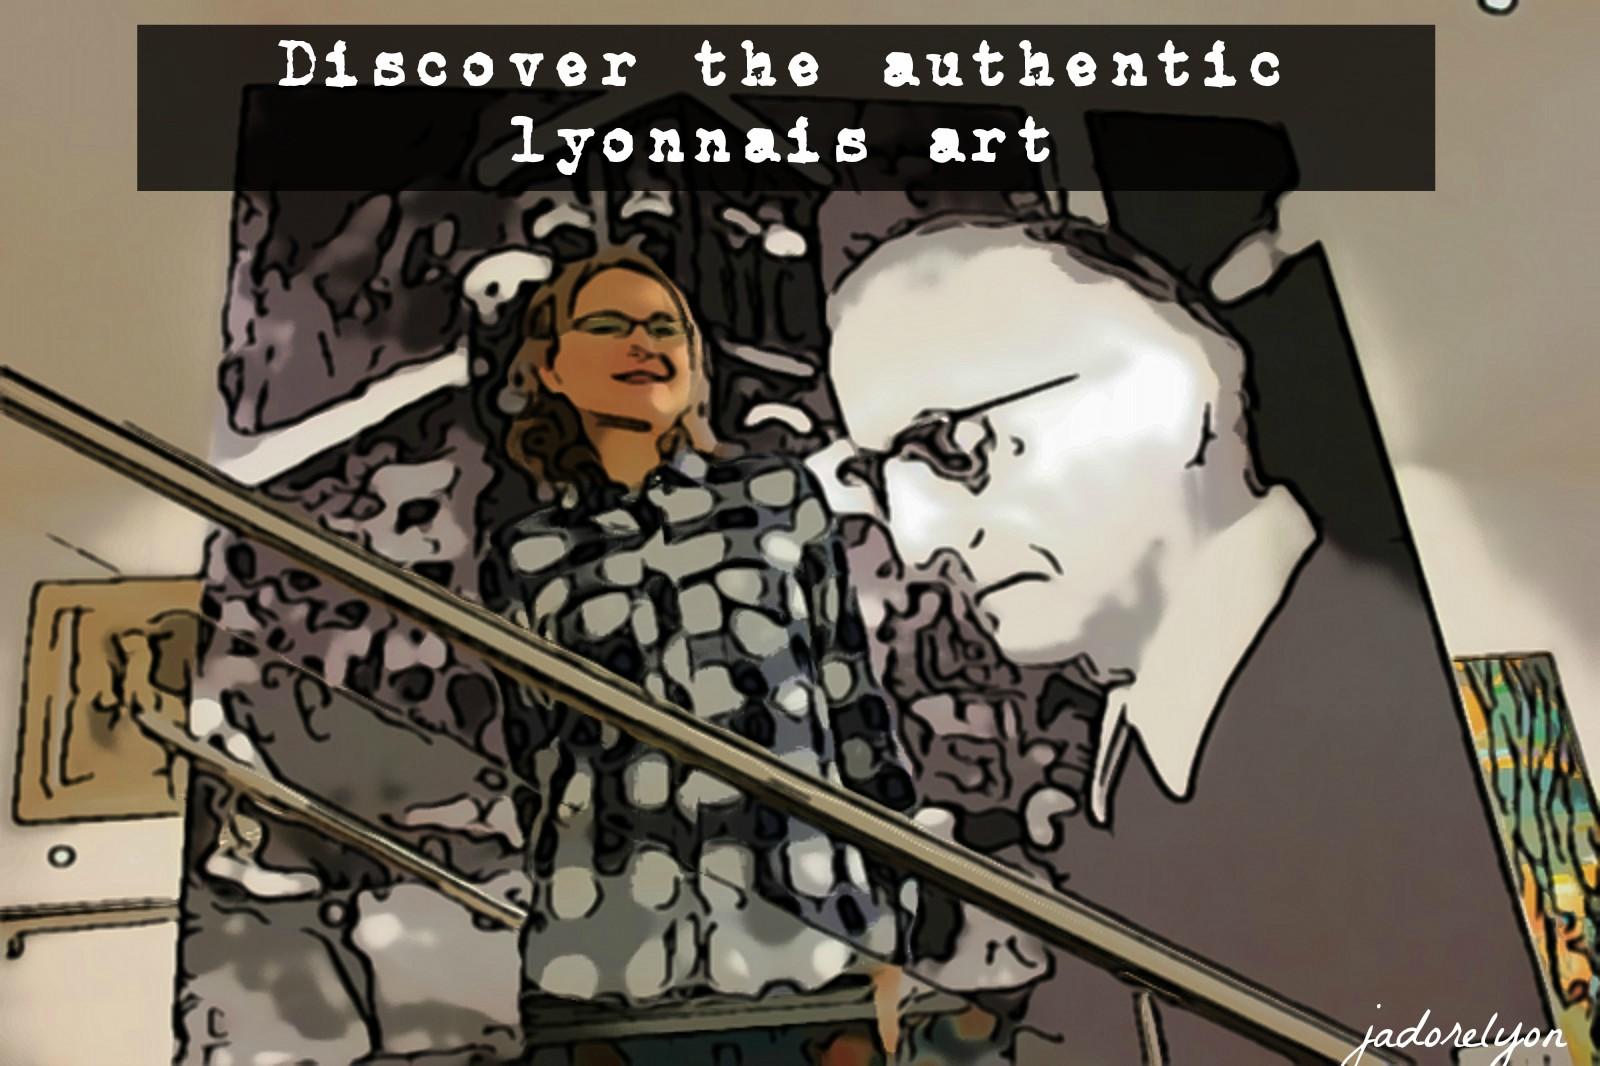 Discover the lyonnais art